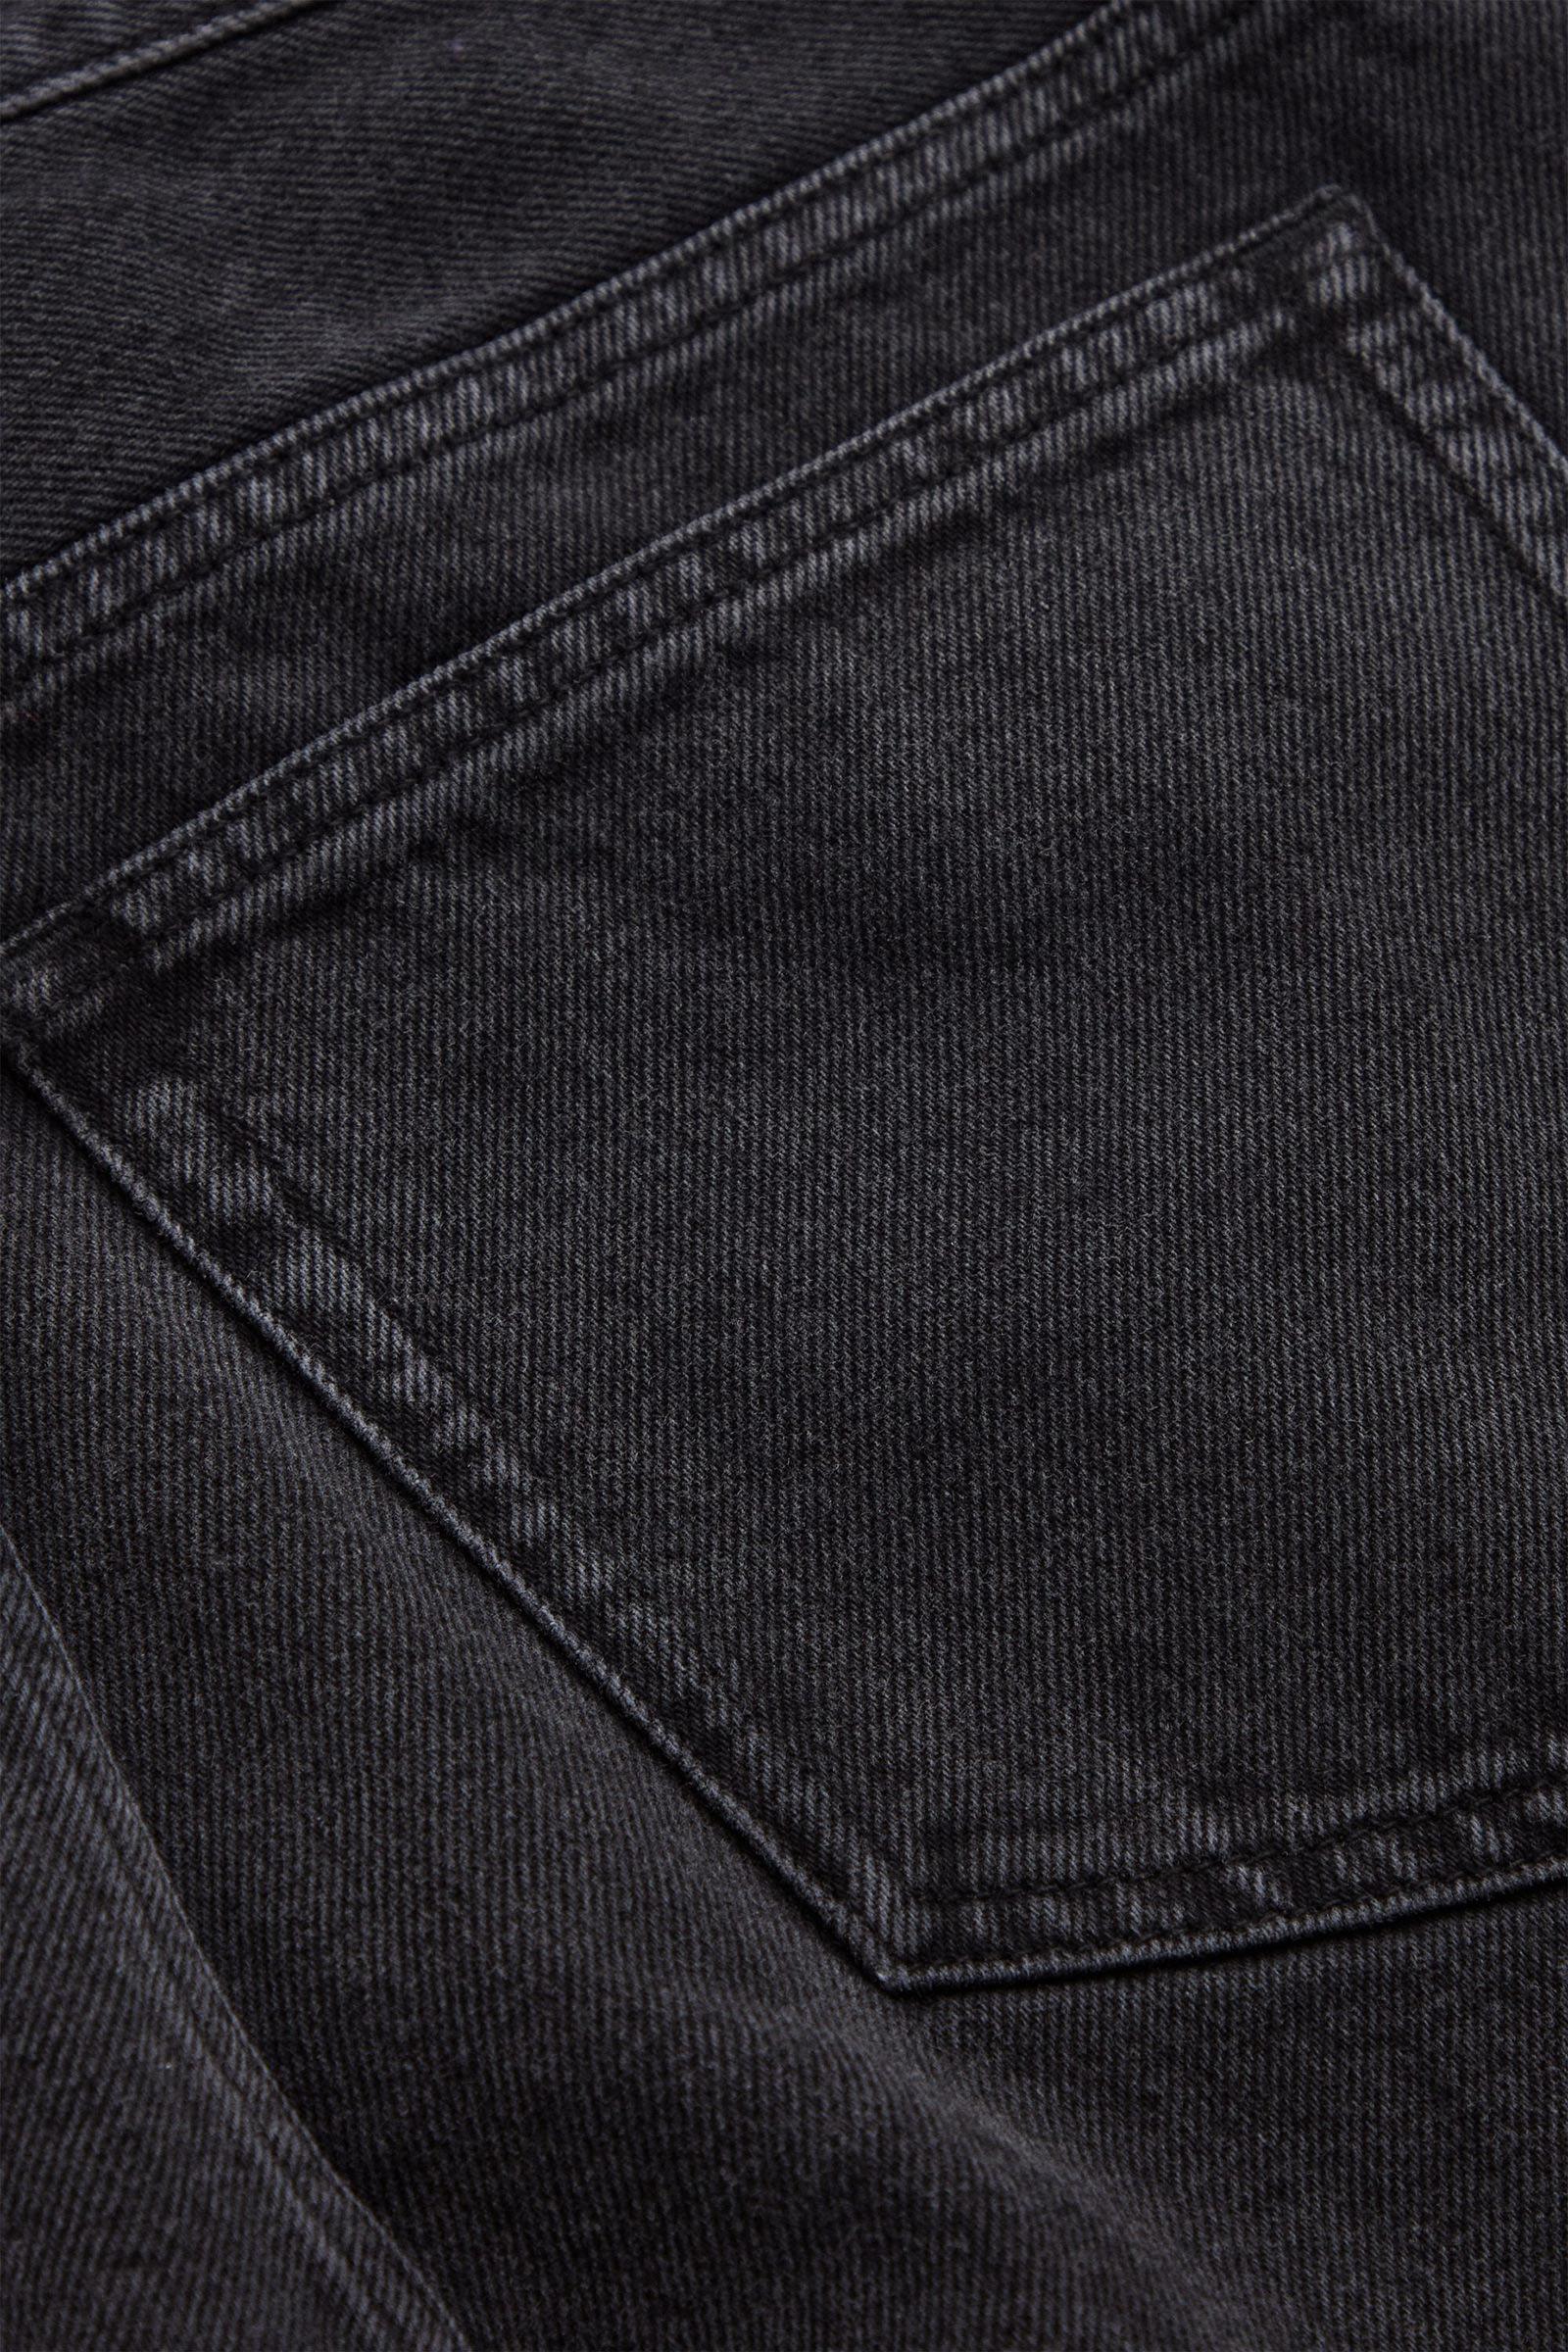 COS 리사이클 코튼 미드 라이즈 스트레이트 진의 그레이컬러 Detail입니다.